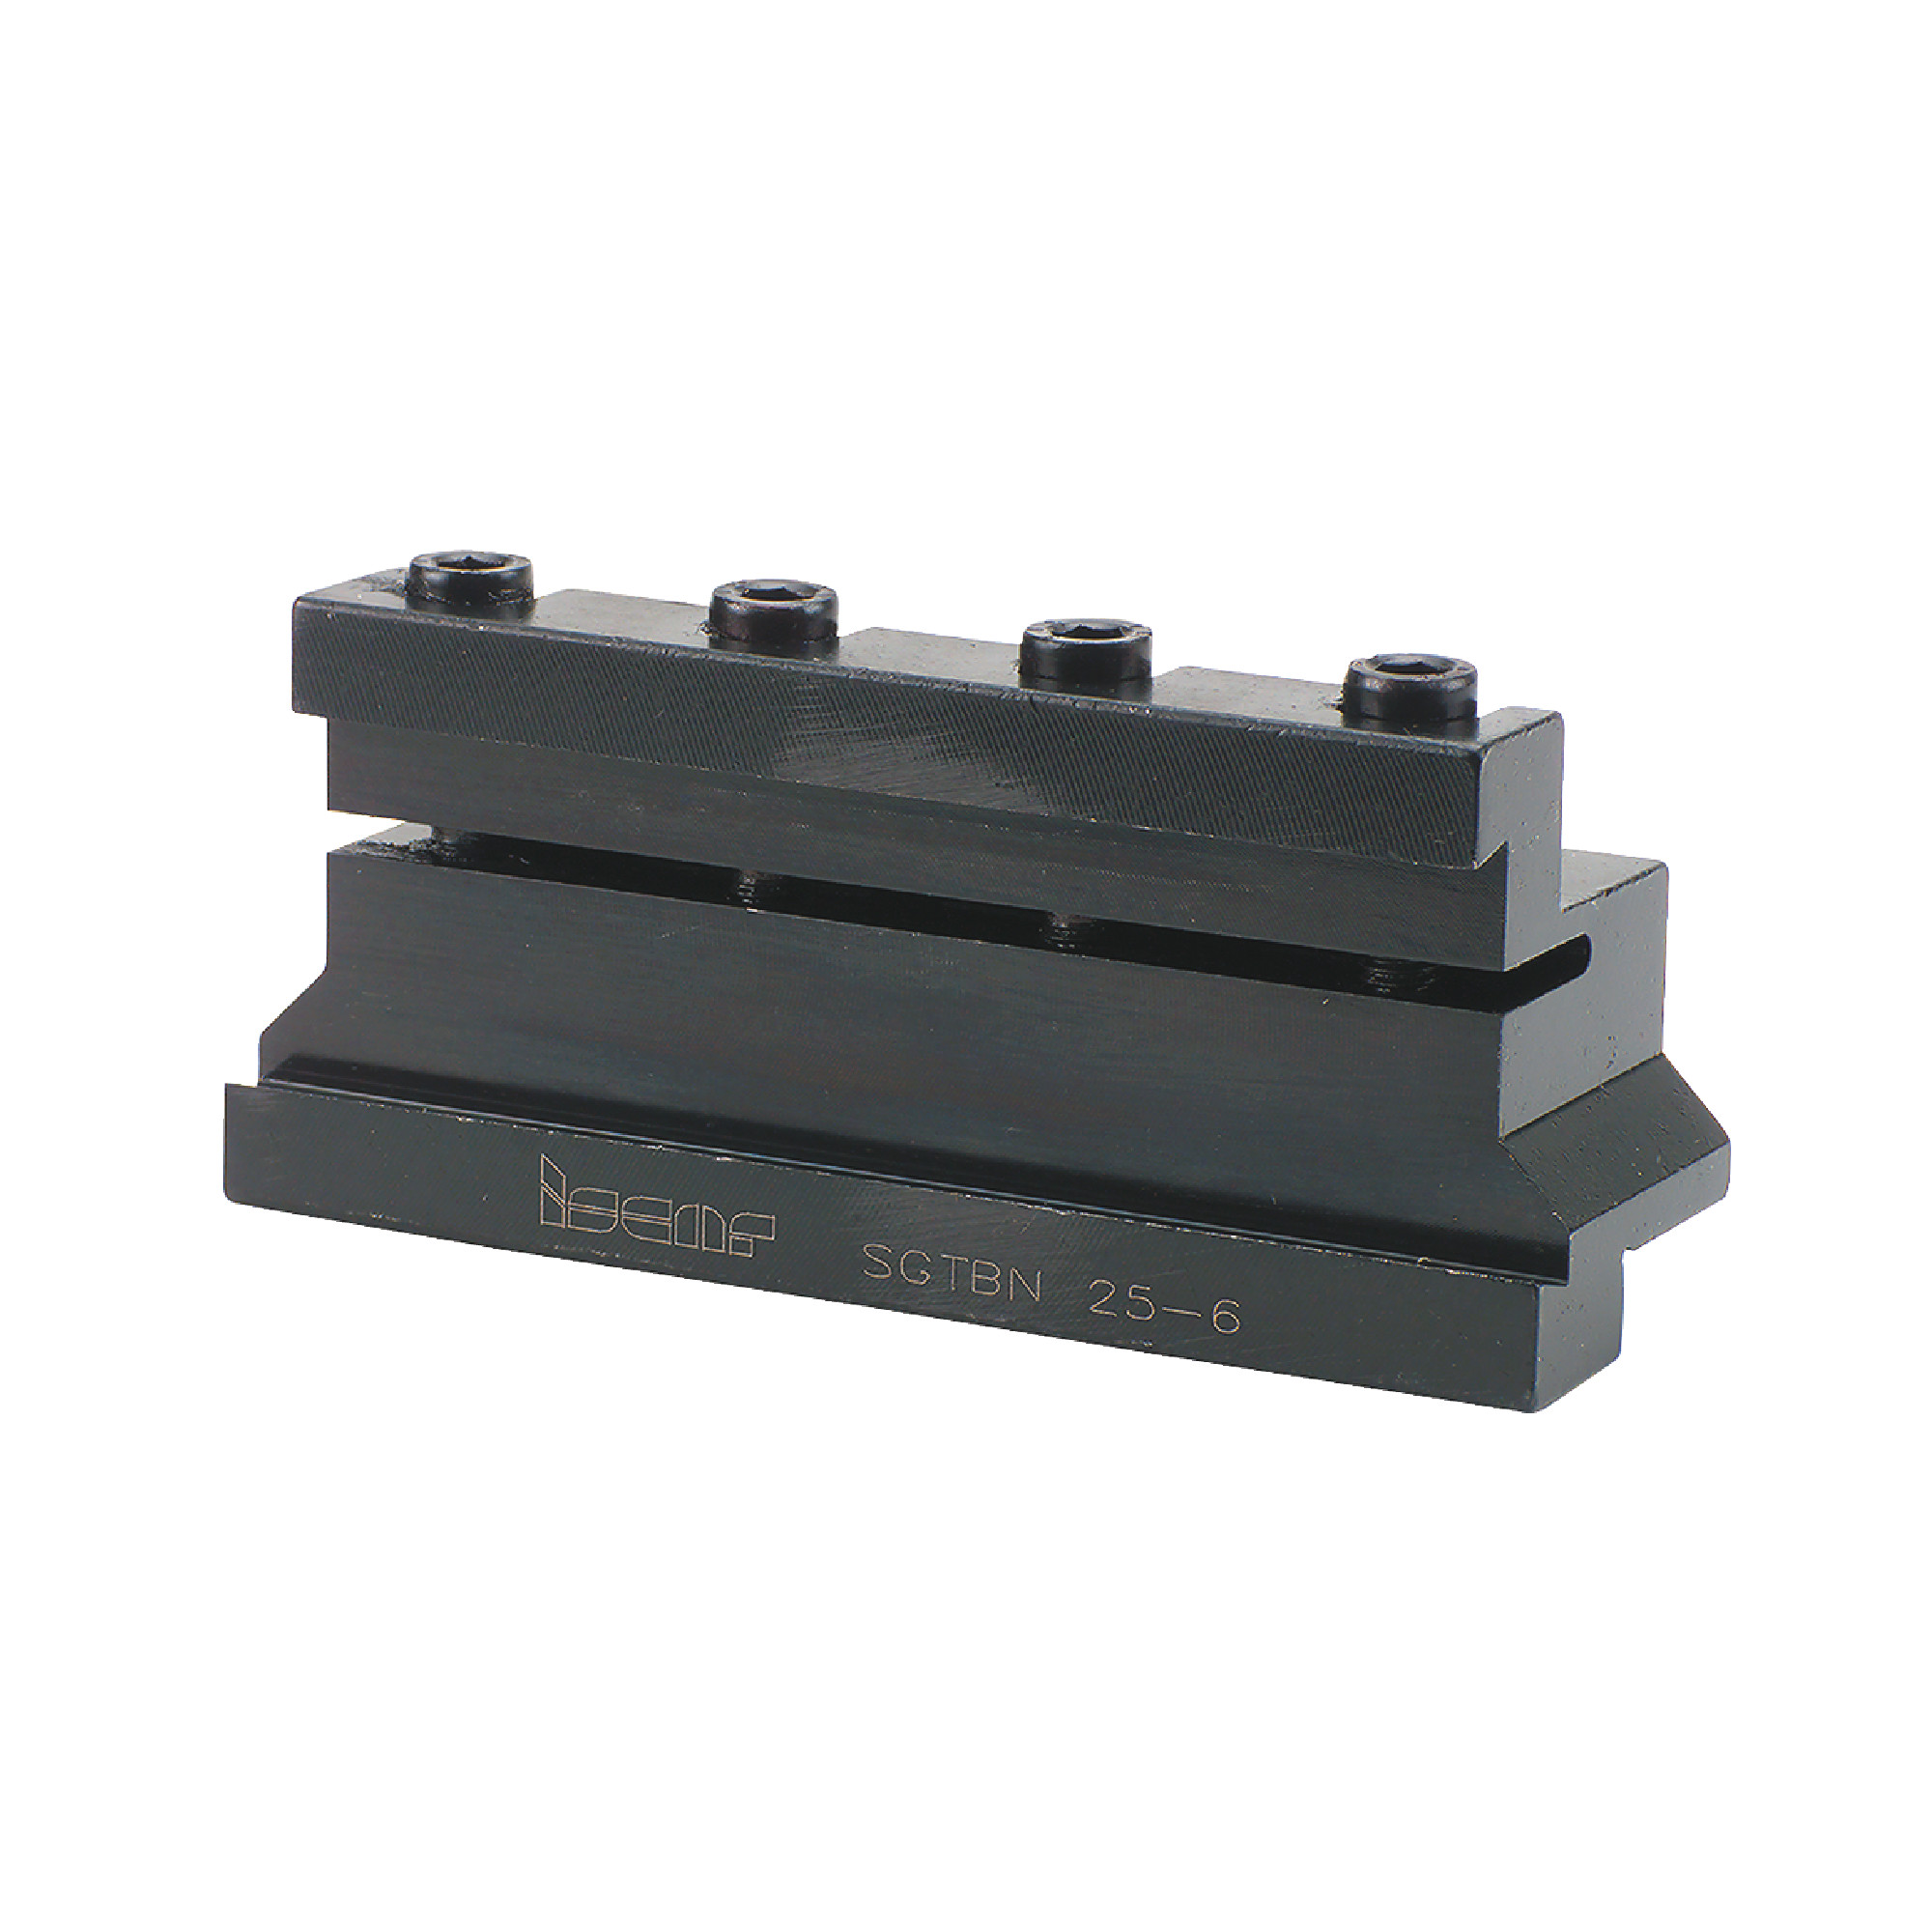 "ISCAR - SGTBN 25-6 Blade Block / .98"" X 0.79"" Shank / For 1.26"" (32mm) Height Blades"